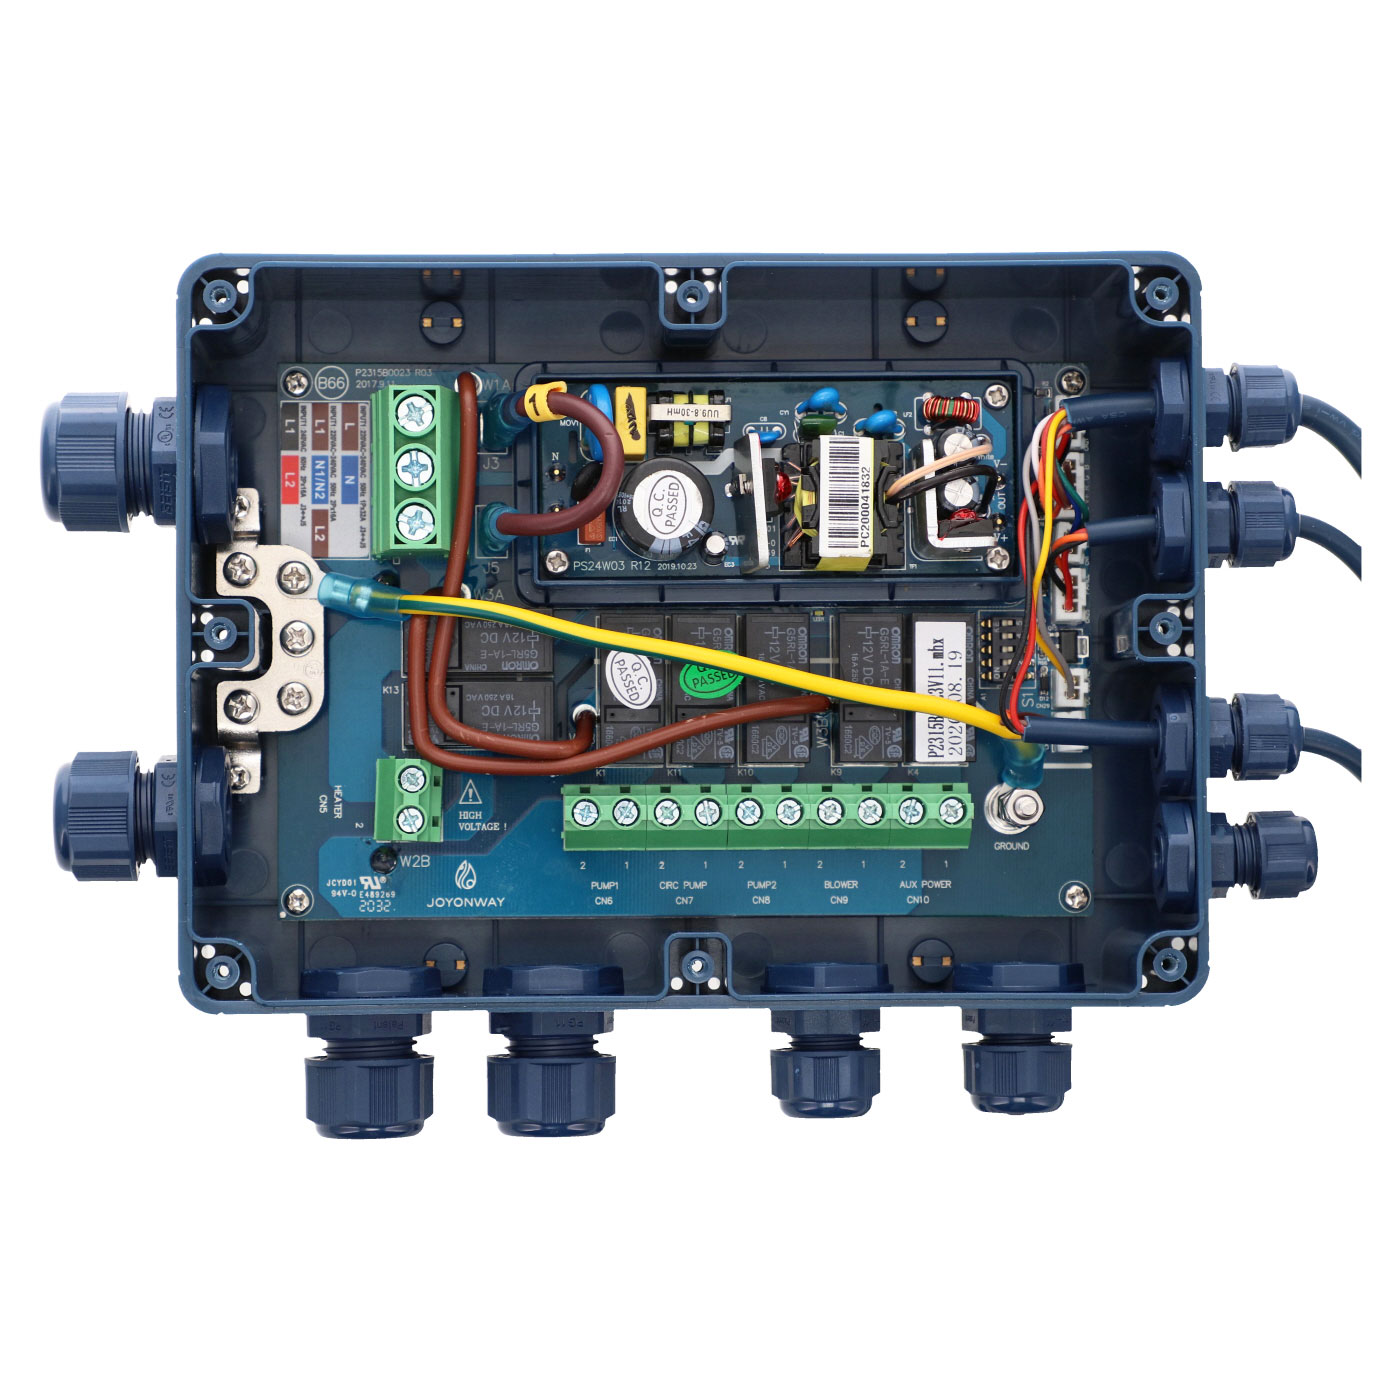 Boitier de contrôle P15B66